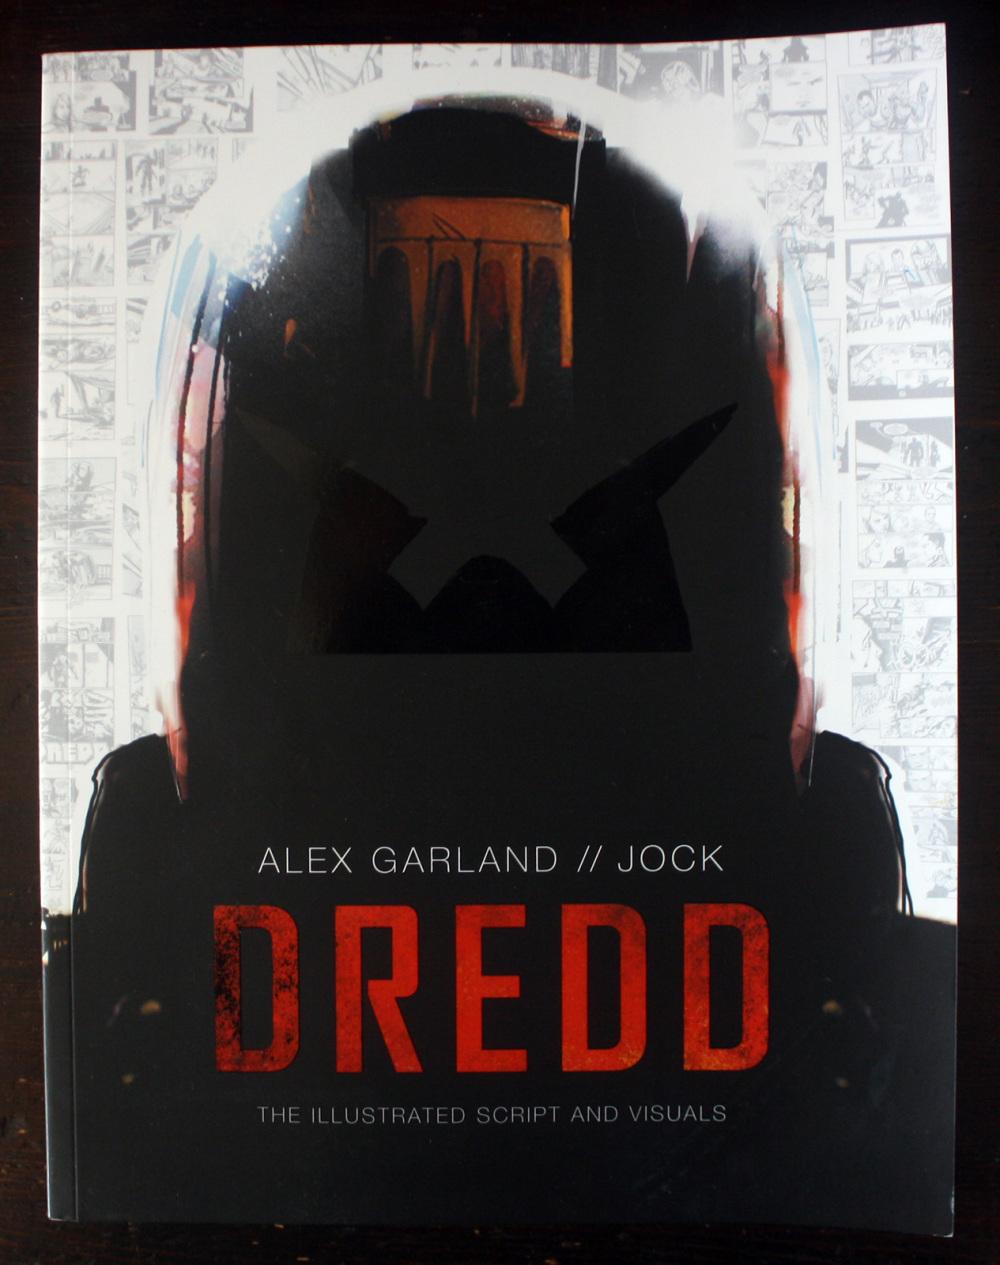 Fraai boek - Dredd: The Illustrated Script and Visuals